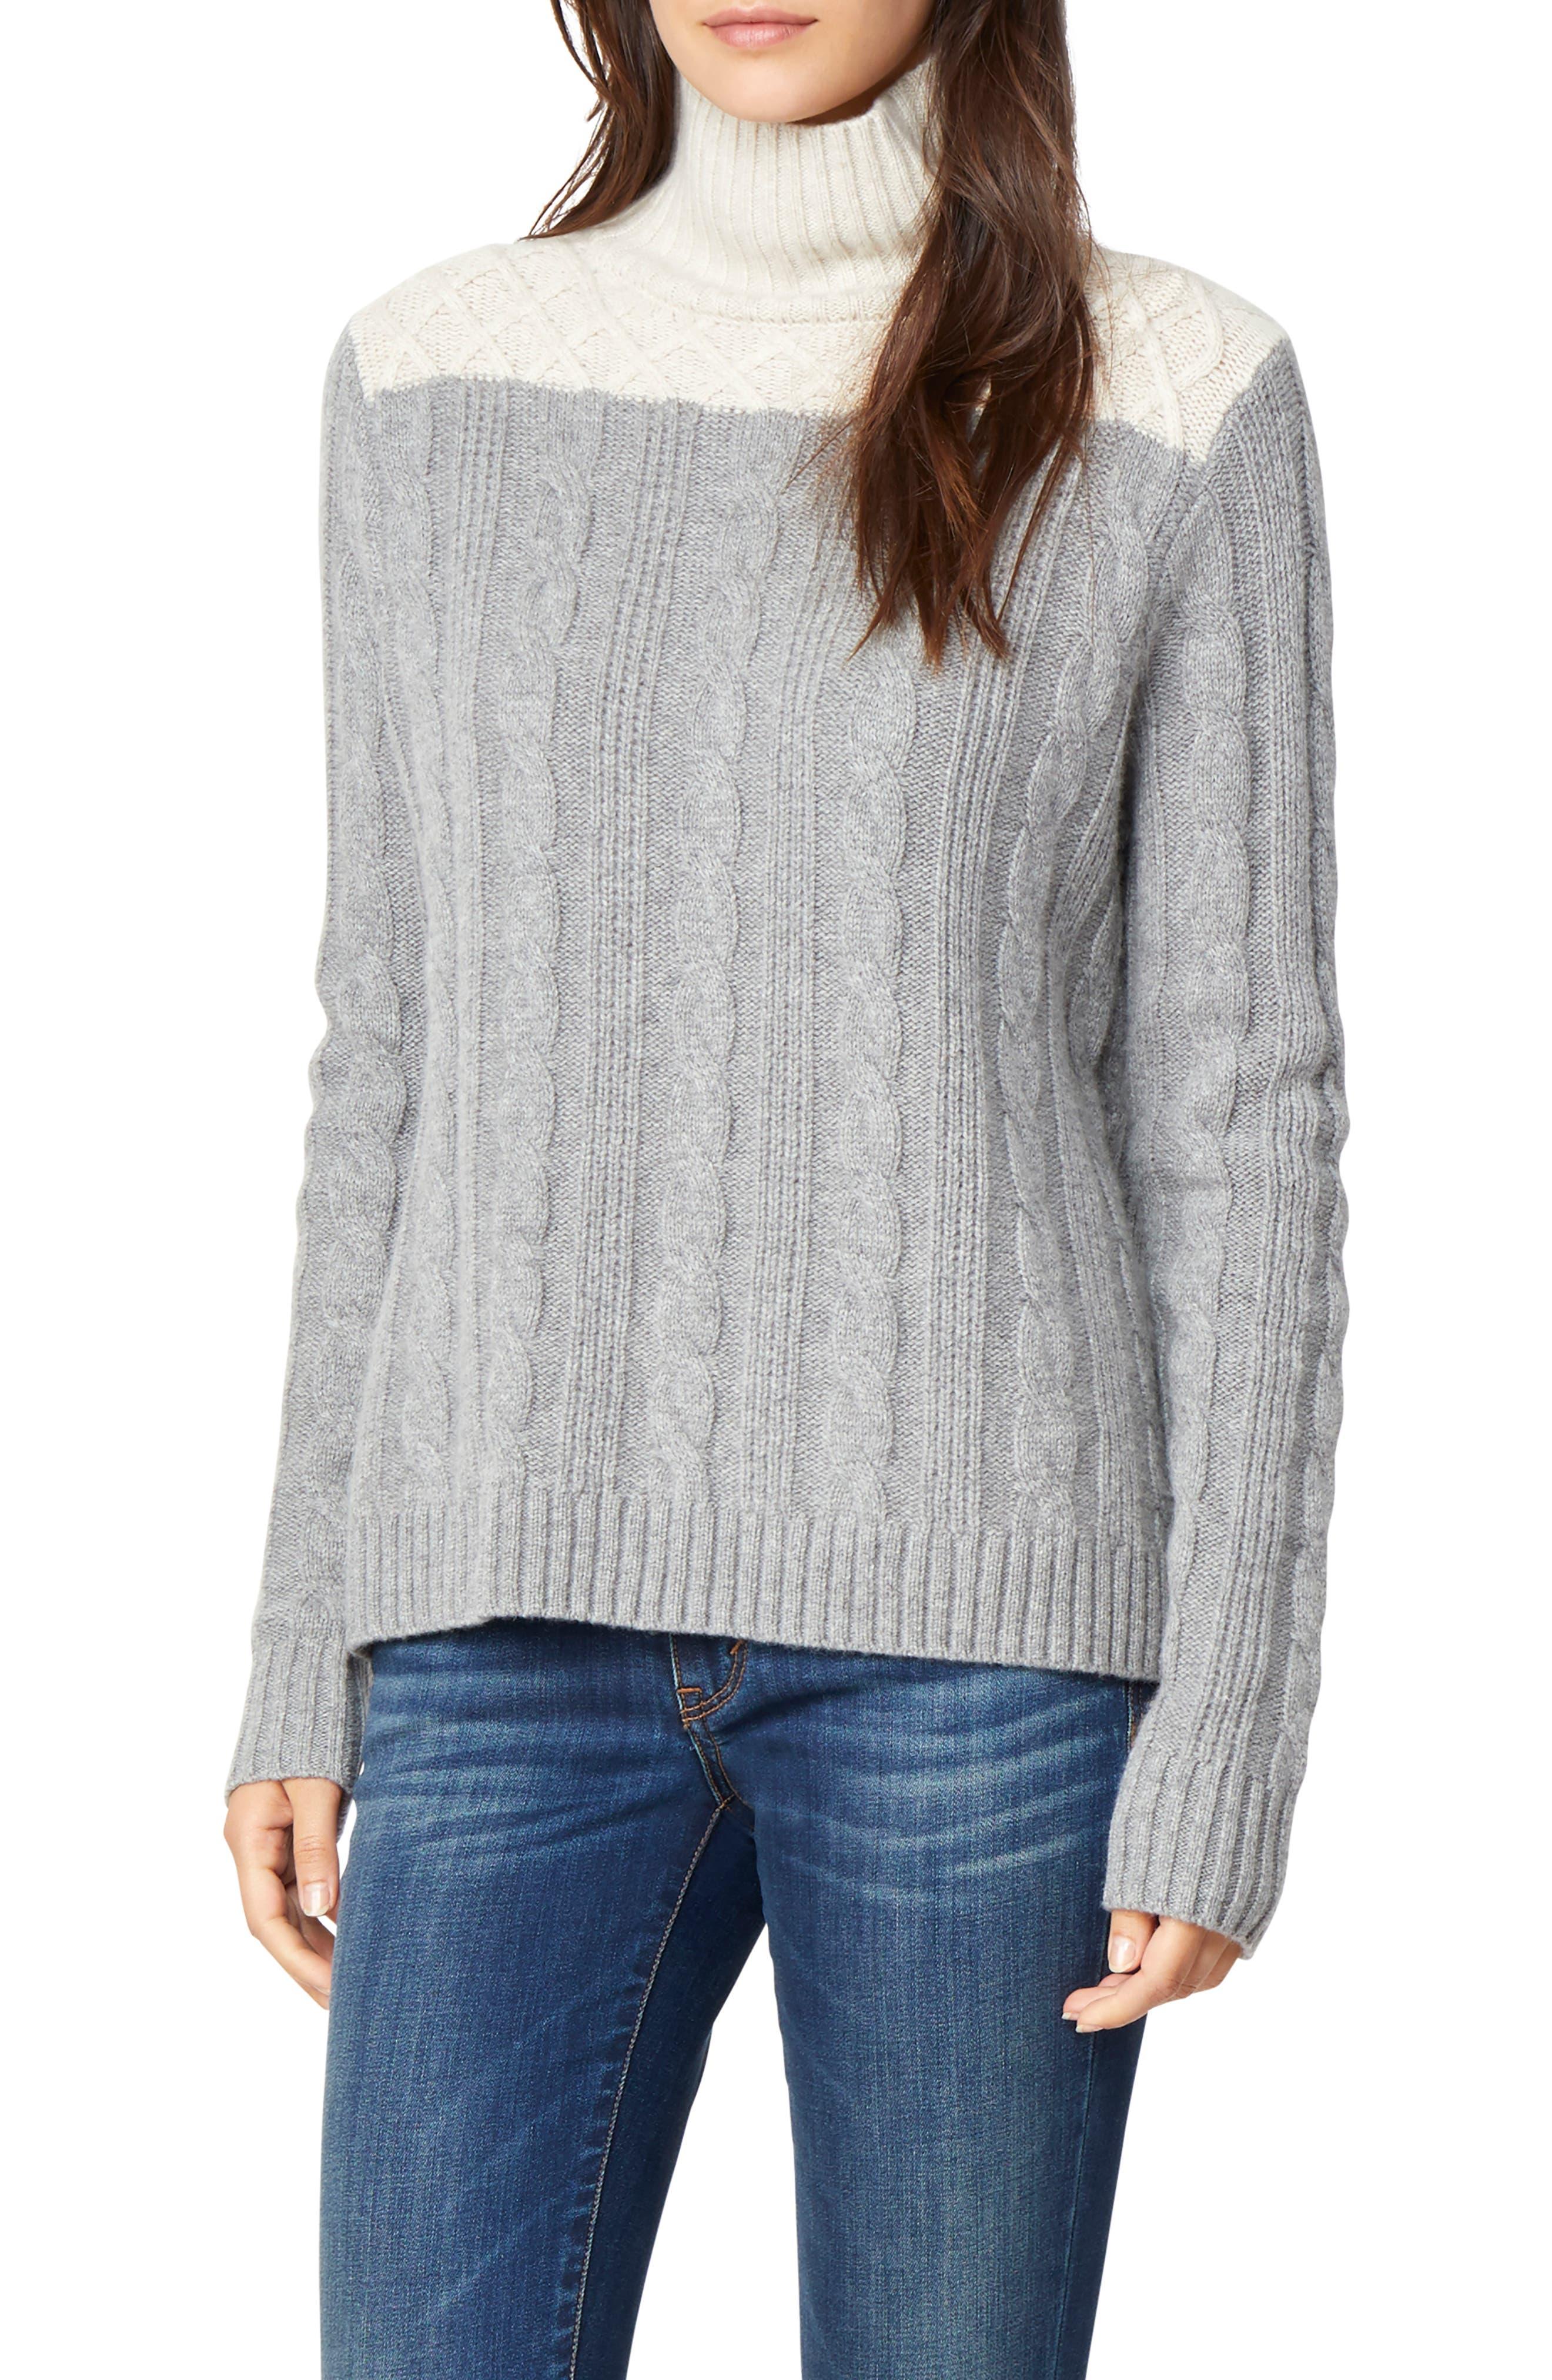 Devin Colorblock Cable Knit Turtleneck Sweater,                         Main,                         color, CHALET/ GREY FLANNEL